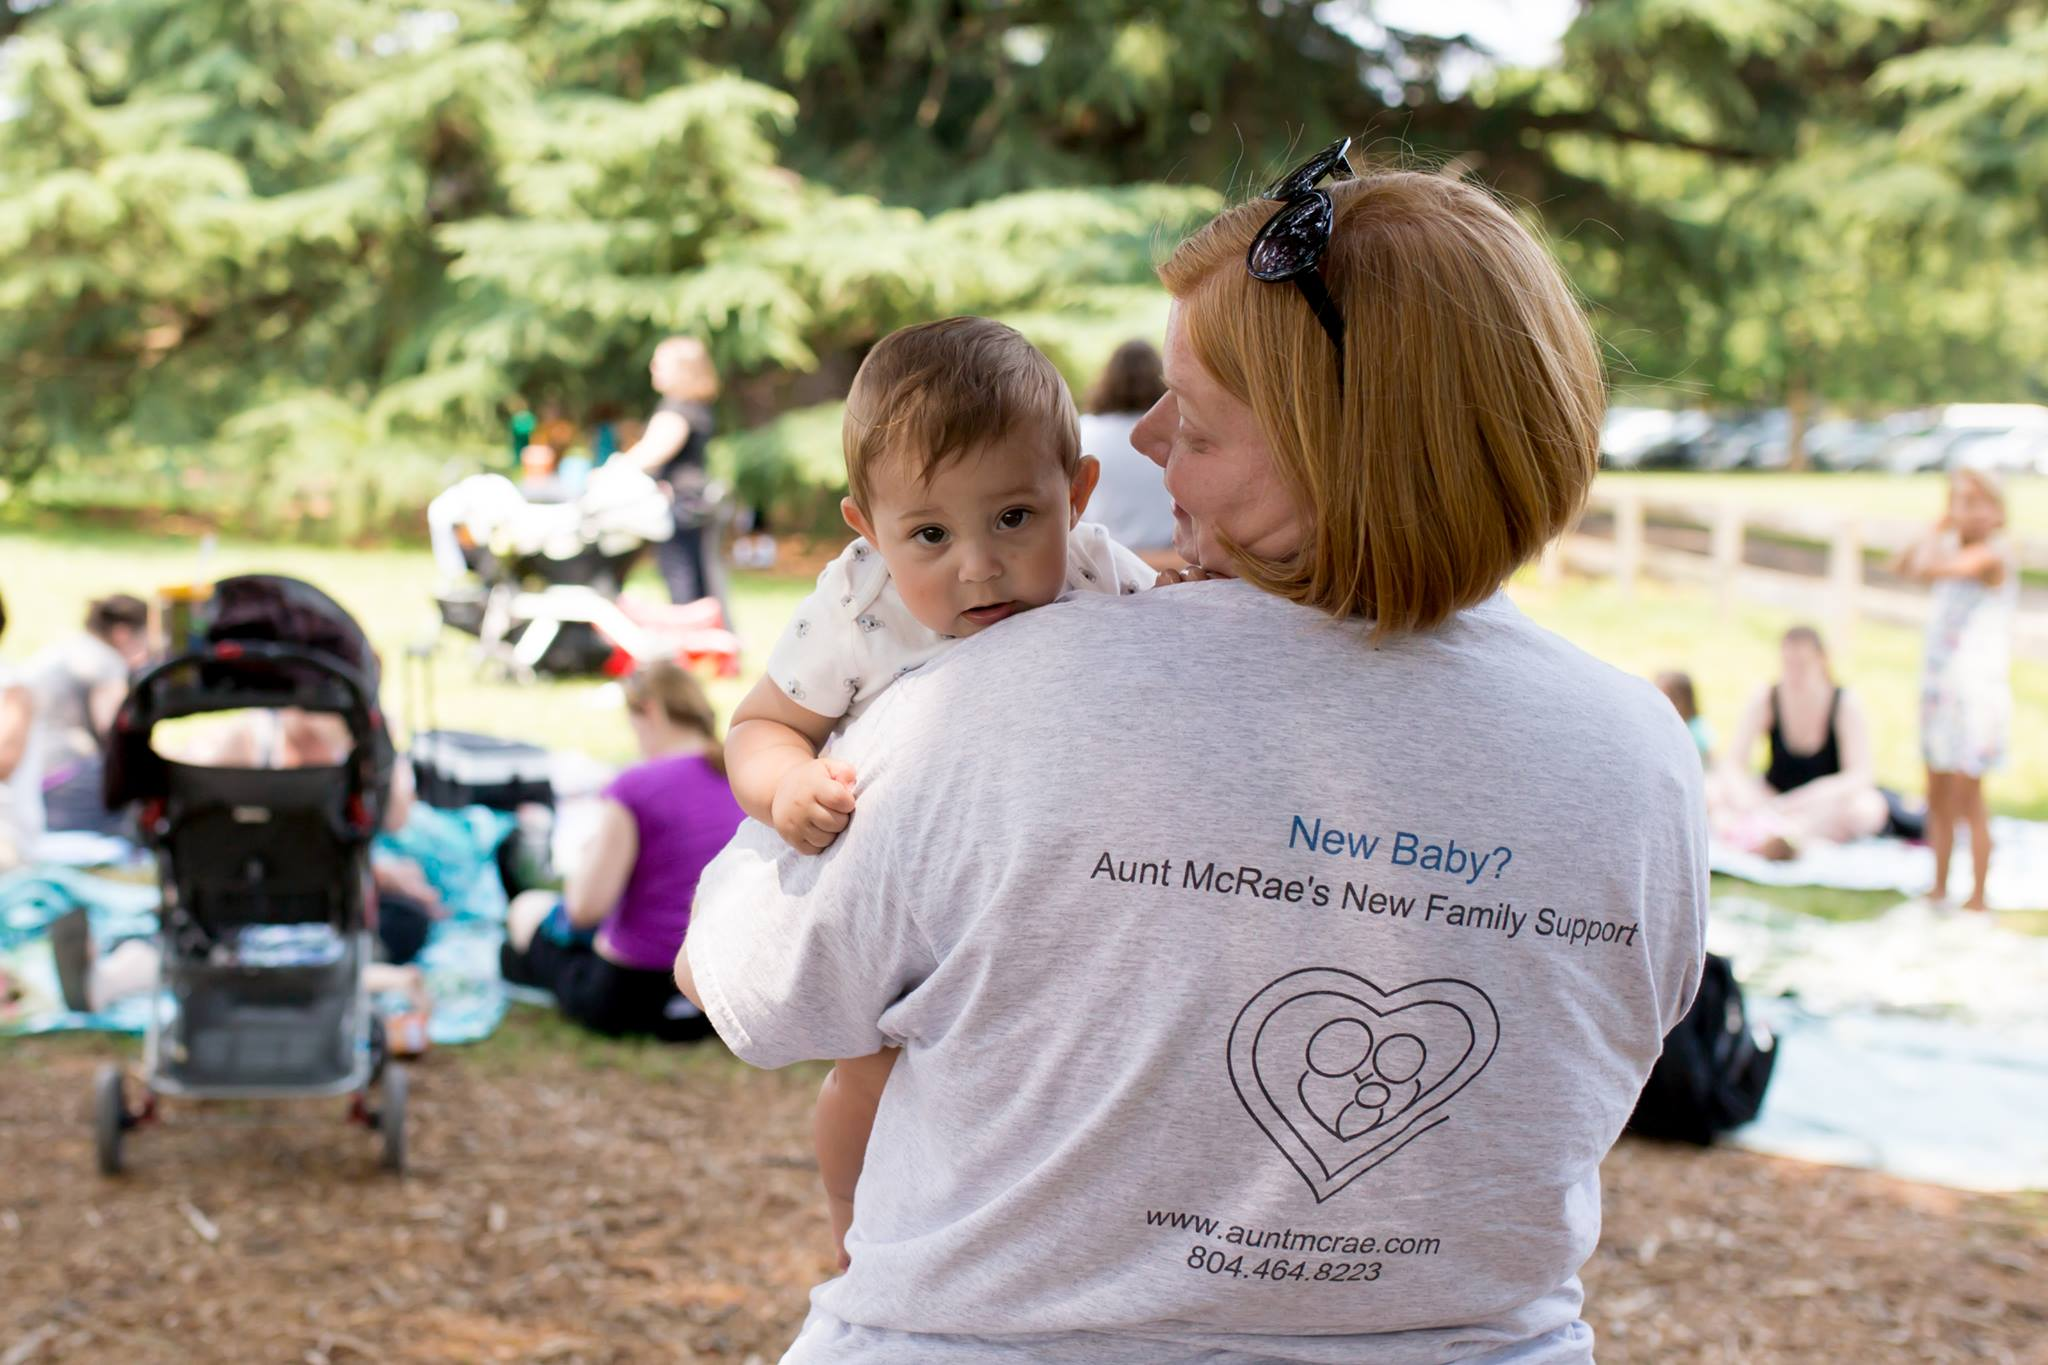 at the celebration for the breastfeeding law passing, taken by  Joy Kraynak, Joyful birth services